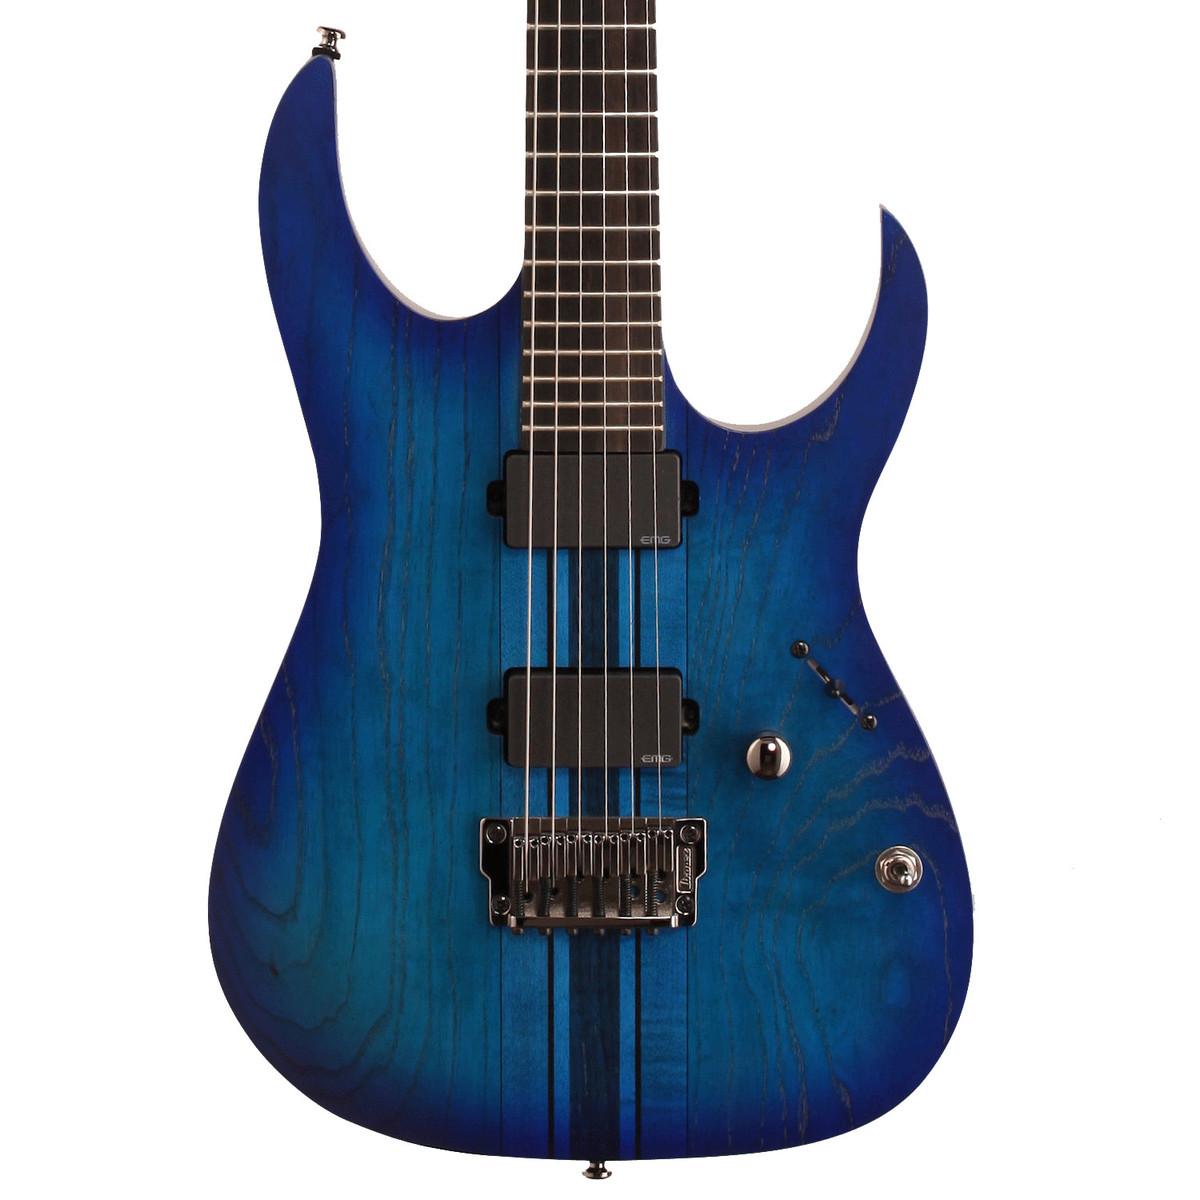 Ibanez Iron Label : disc ibanez rgit20fe iron label electric guitar sapphire blue flat b stock at ~ Vivirlamusica.com Haus und Dekorationen